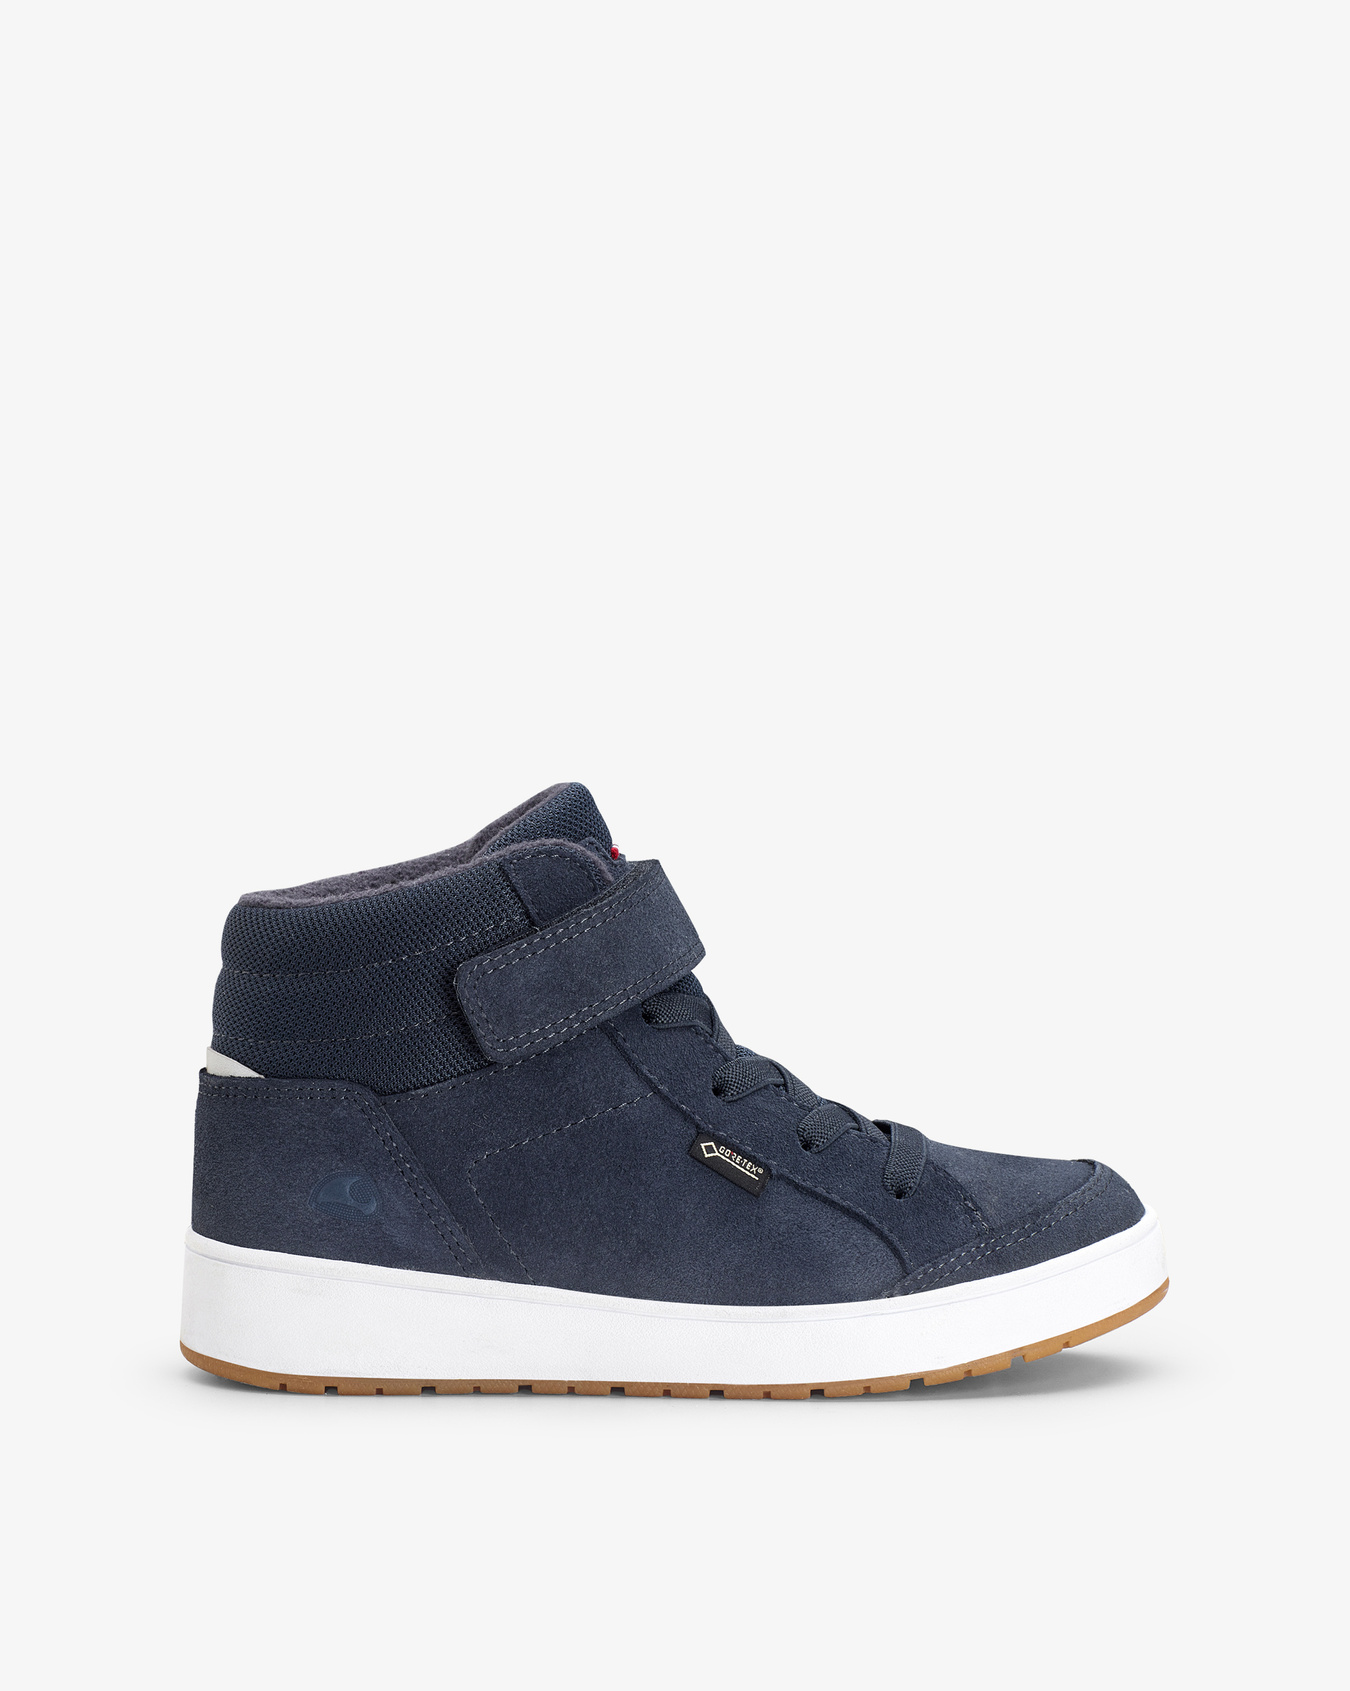 Eagle Warm GTX Navy Sneaker